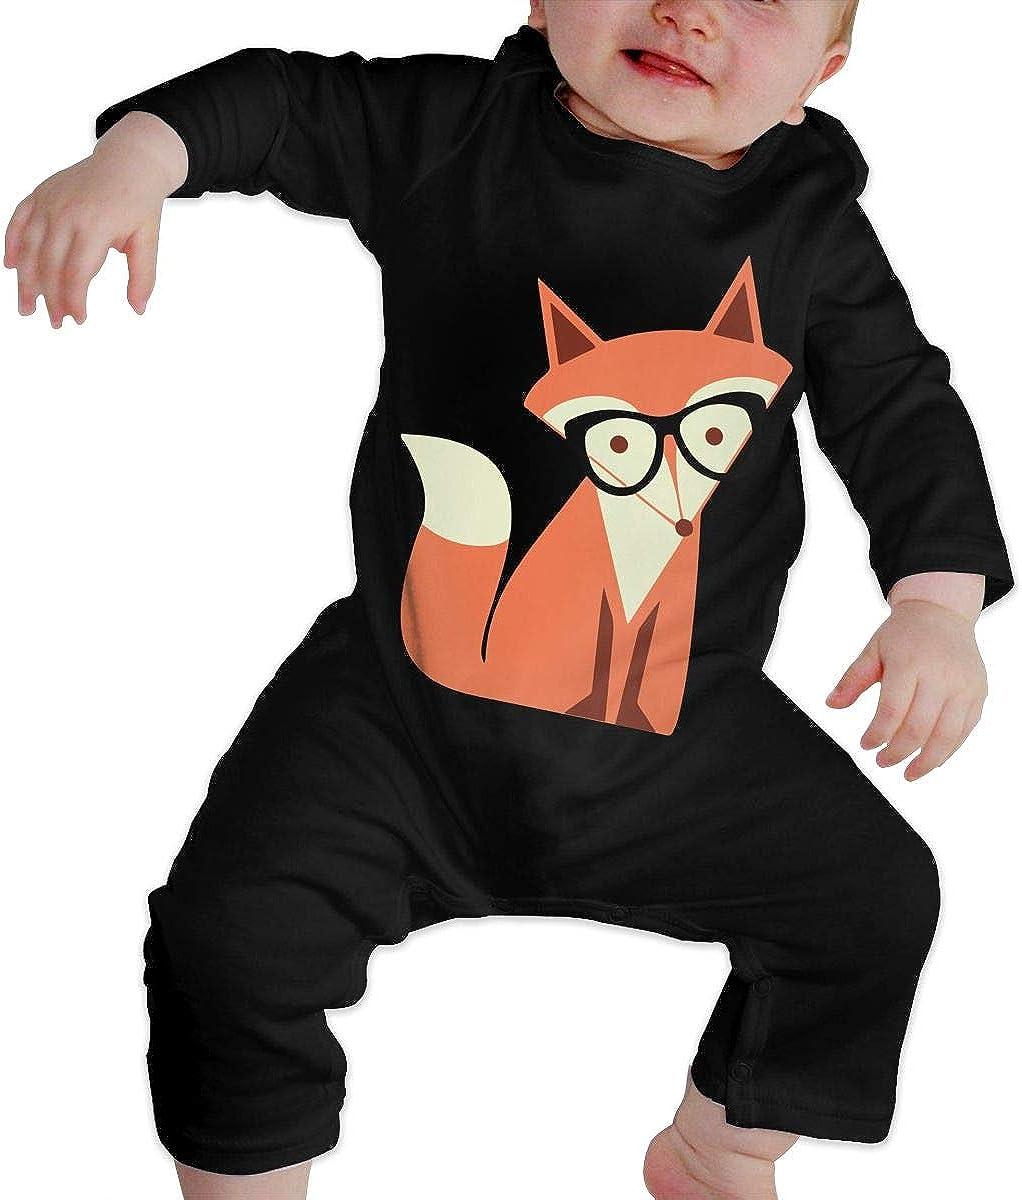 Cute Cartoon Hipster Fox Printed Newborn Baby Boy Girl Jumpsuit Long Sleeve Romper Black